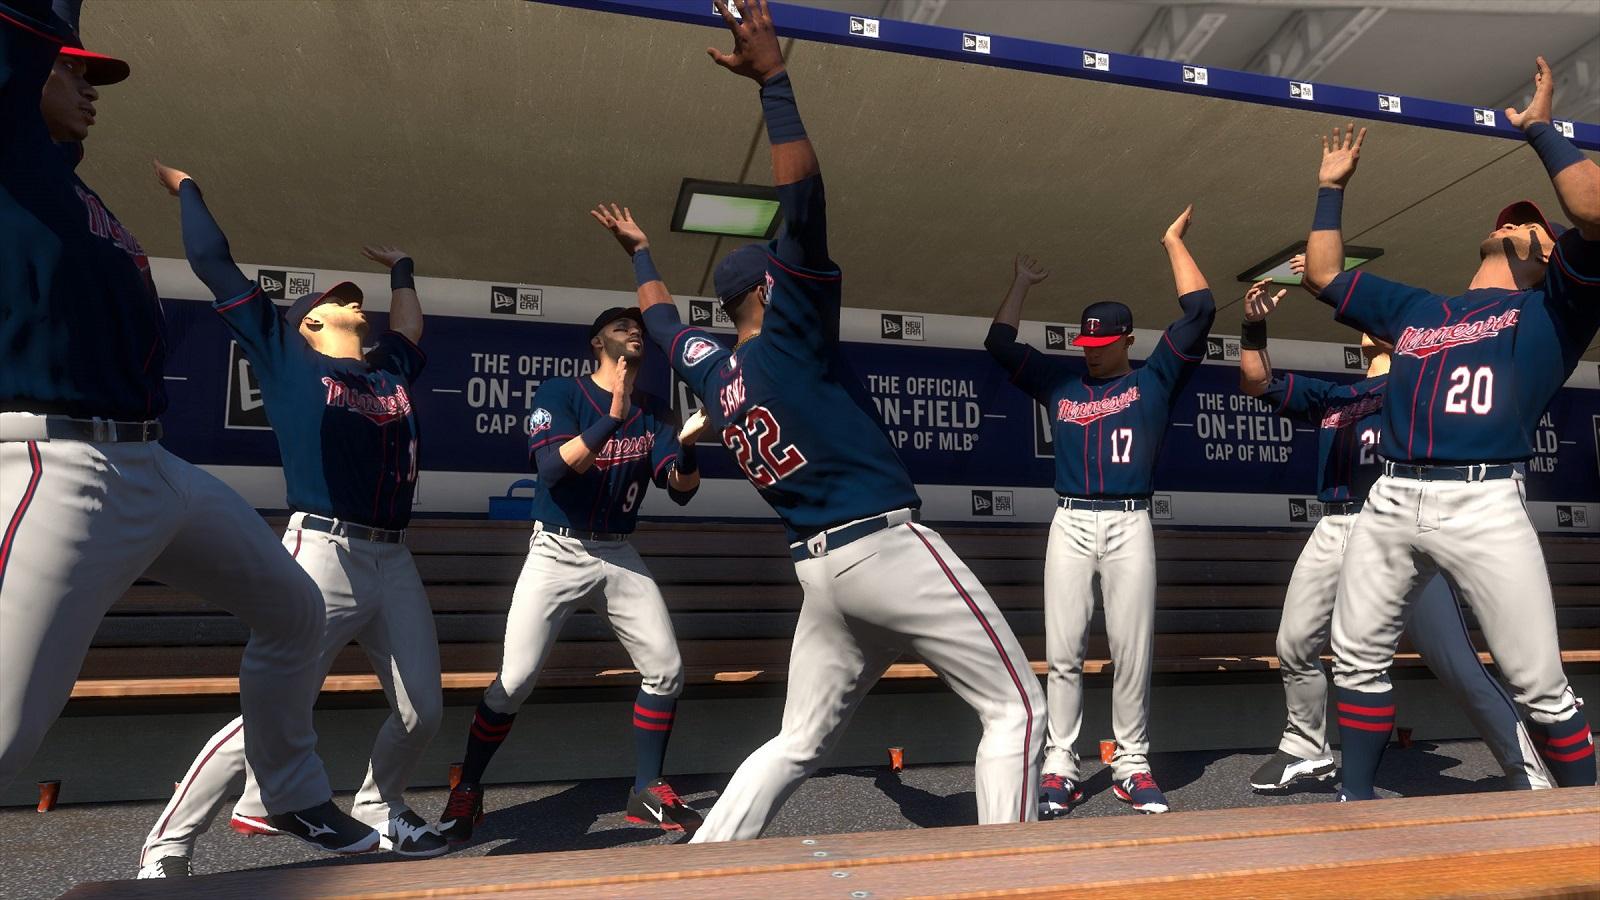 Первую мультиплатформенную MLB The Show представят в феврале